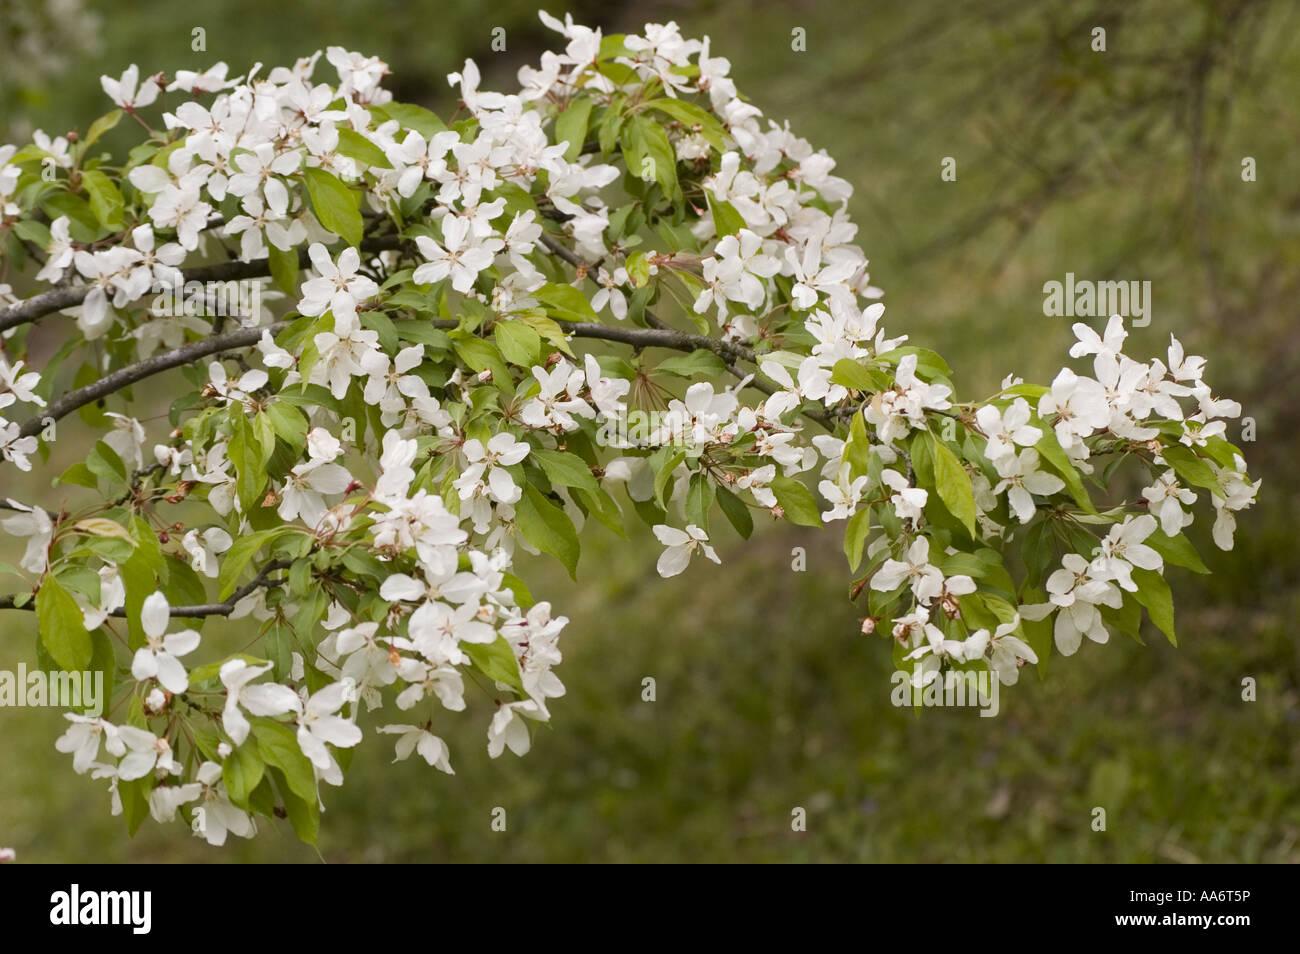 Spring White Flowers On The Branch Of Japanese Flowering Crabapple